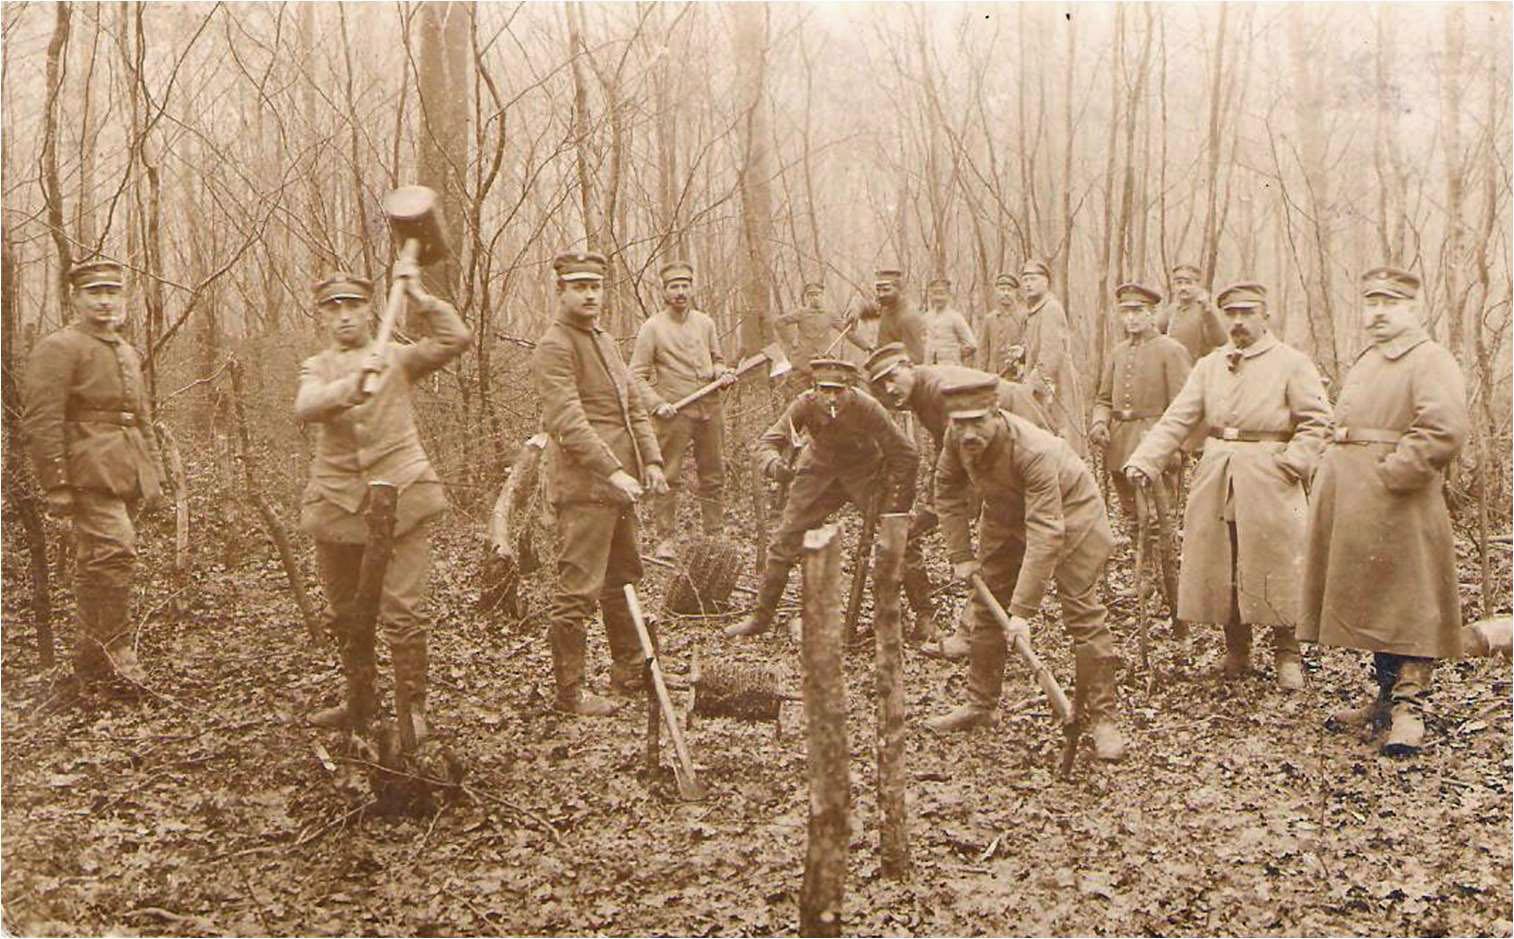 3. september 1917. Straffefangen Claus Clausen får kontakt til sine forældre